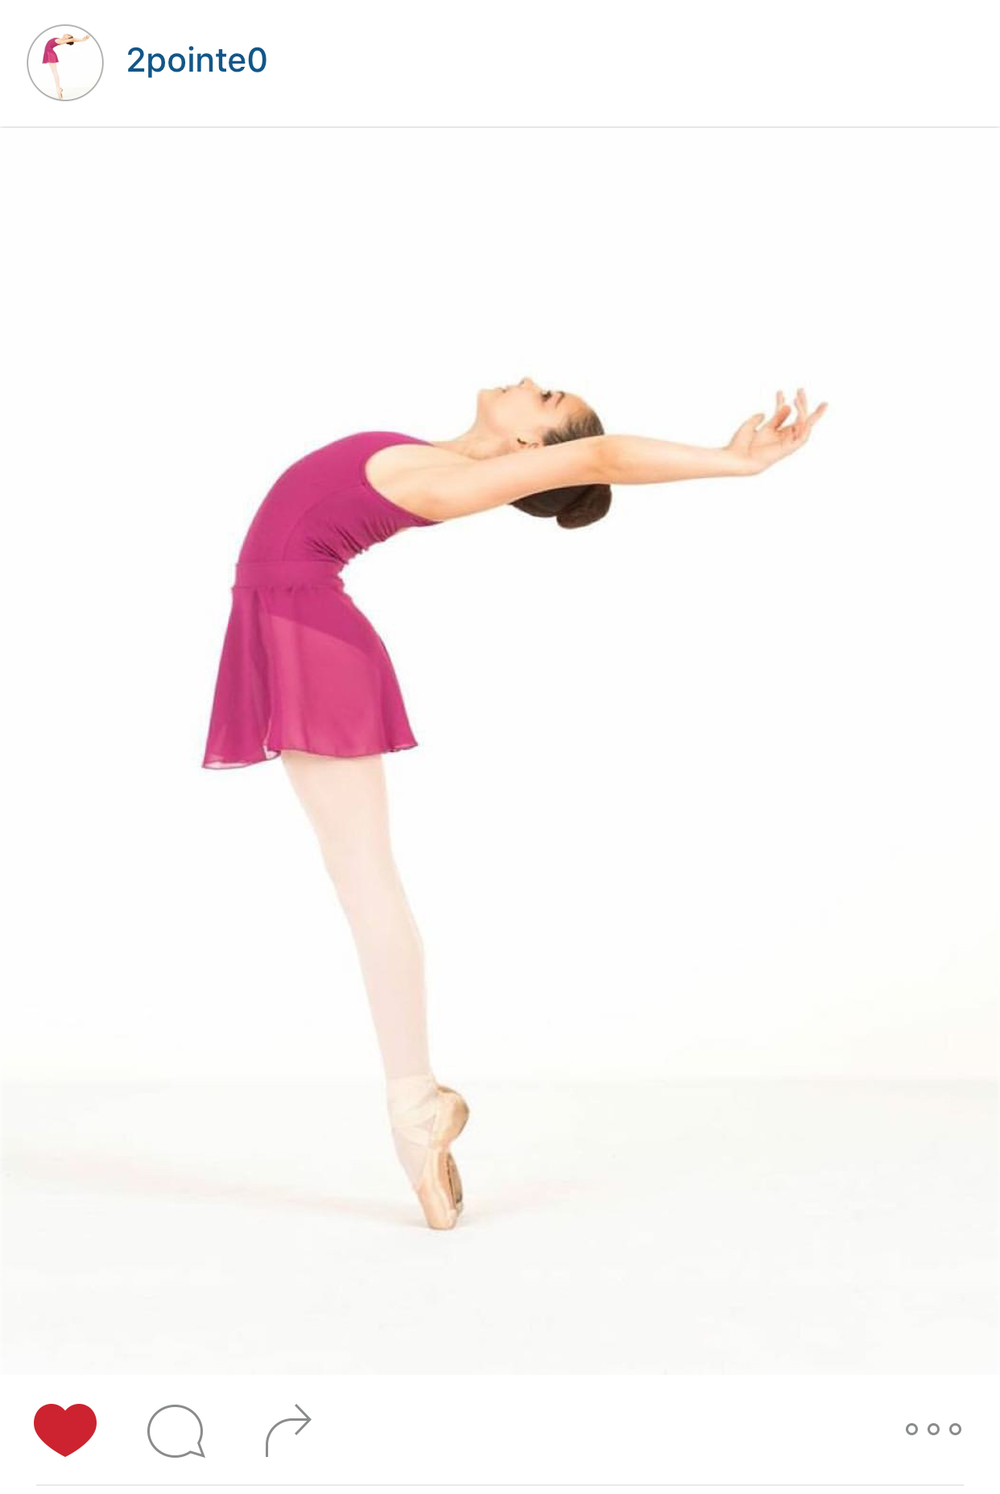 Dancer - @2Pointe0 Photographer - CMYK Photography